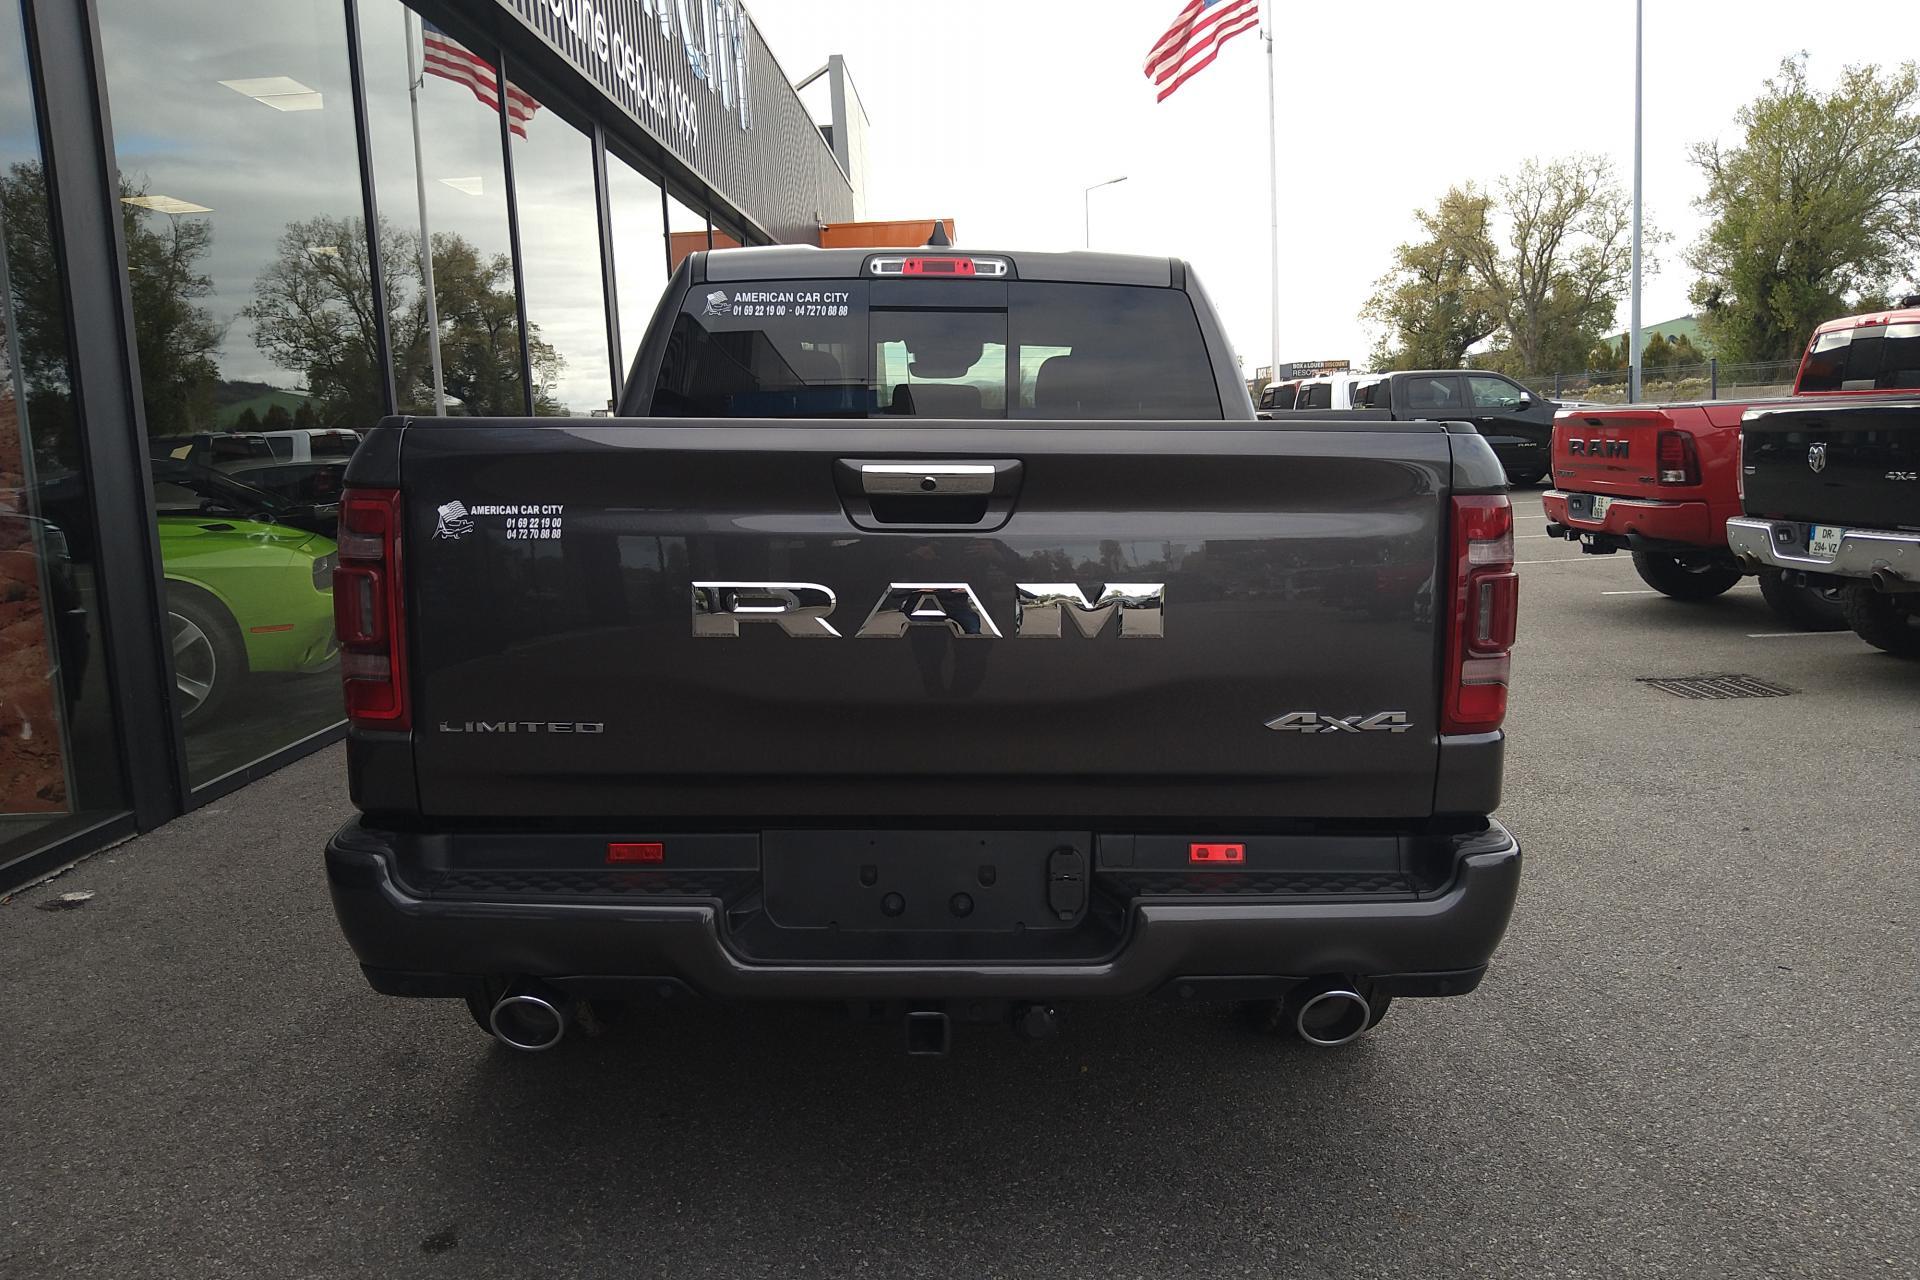 DODGE RAM 1500 CREW LIMITED 2020